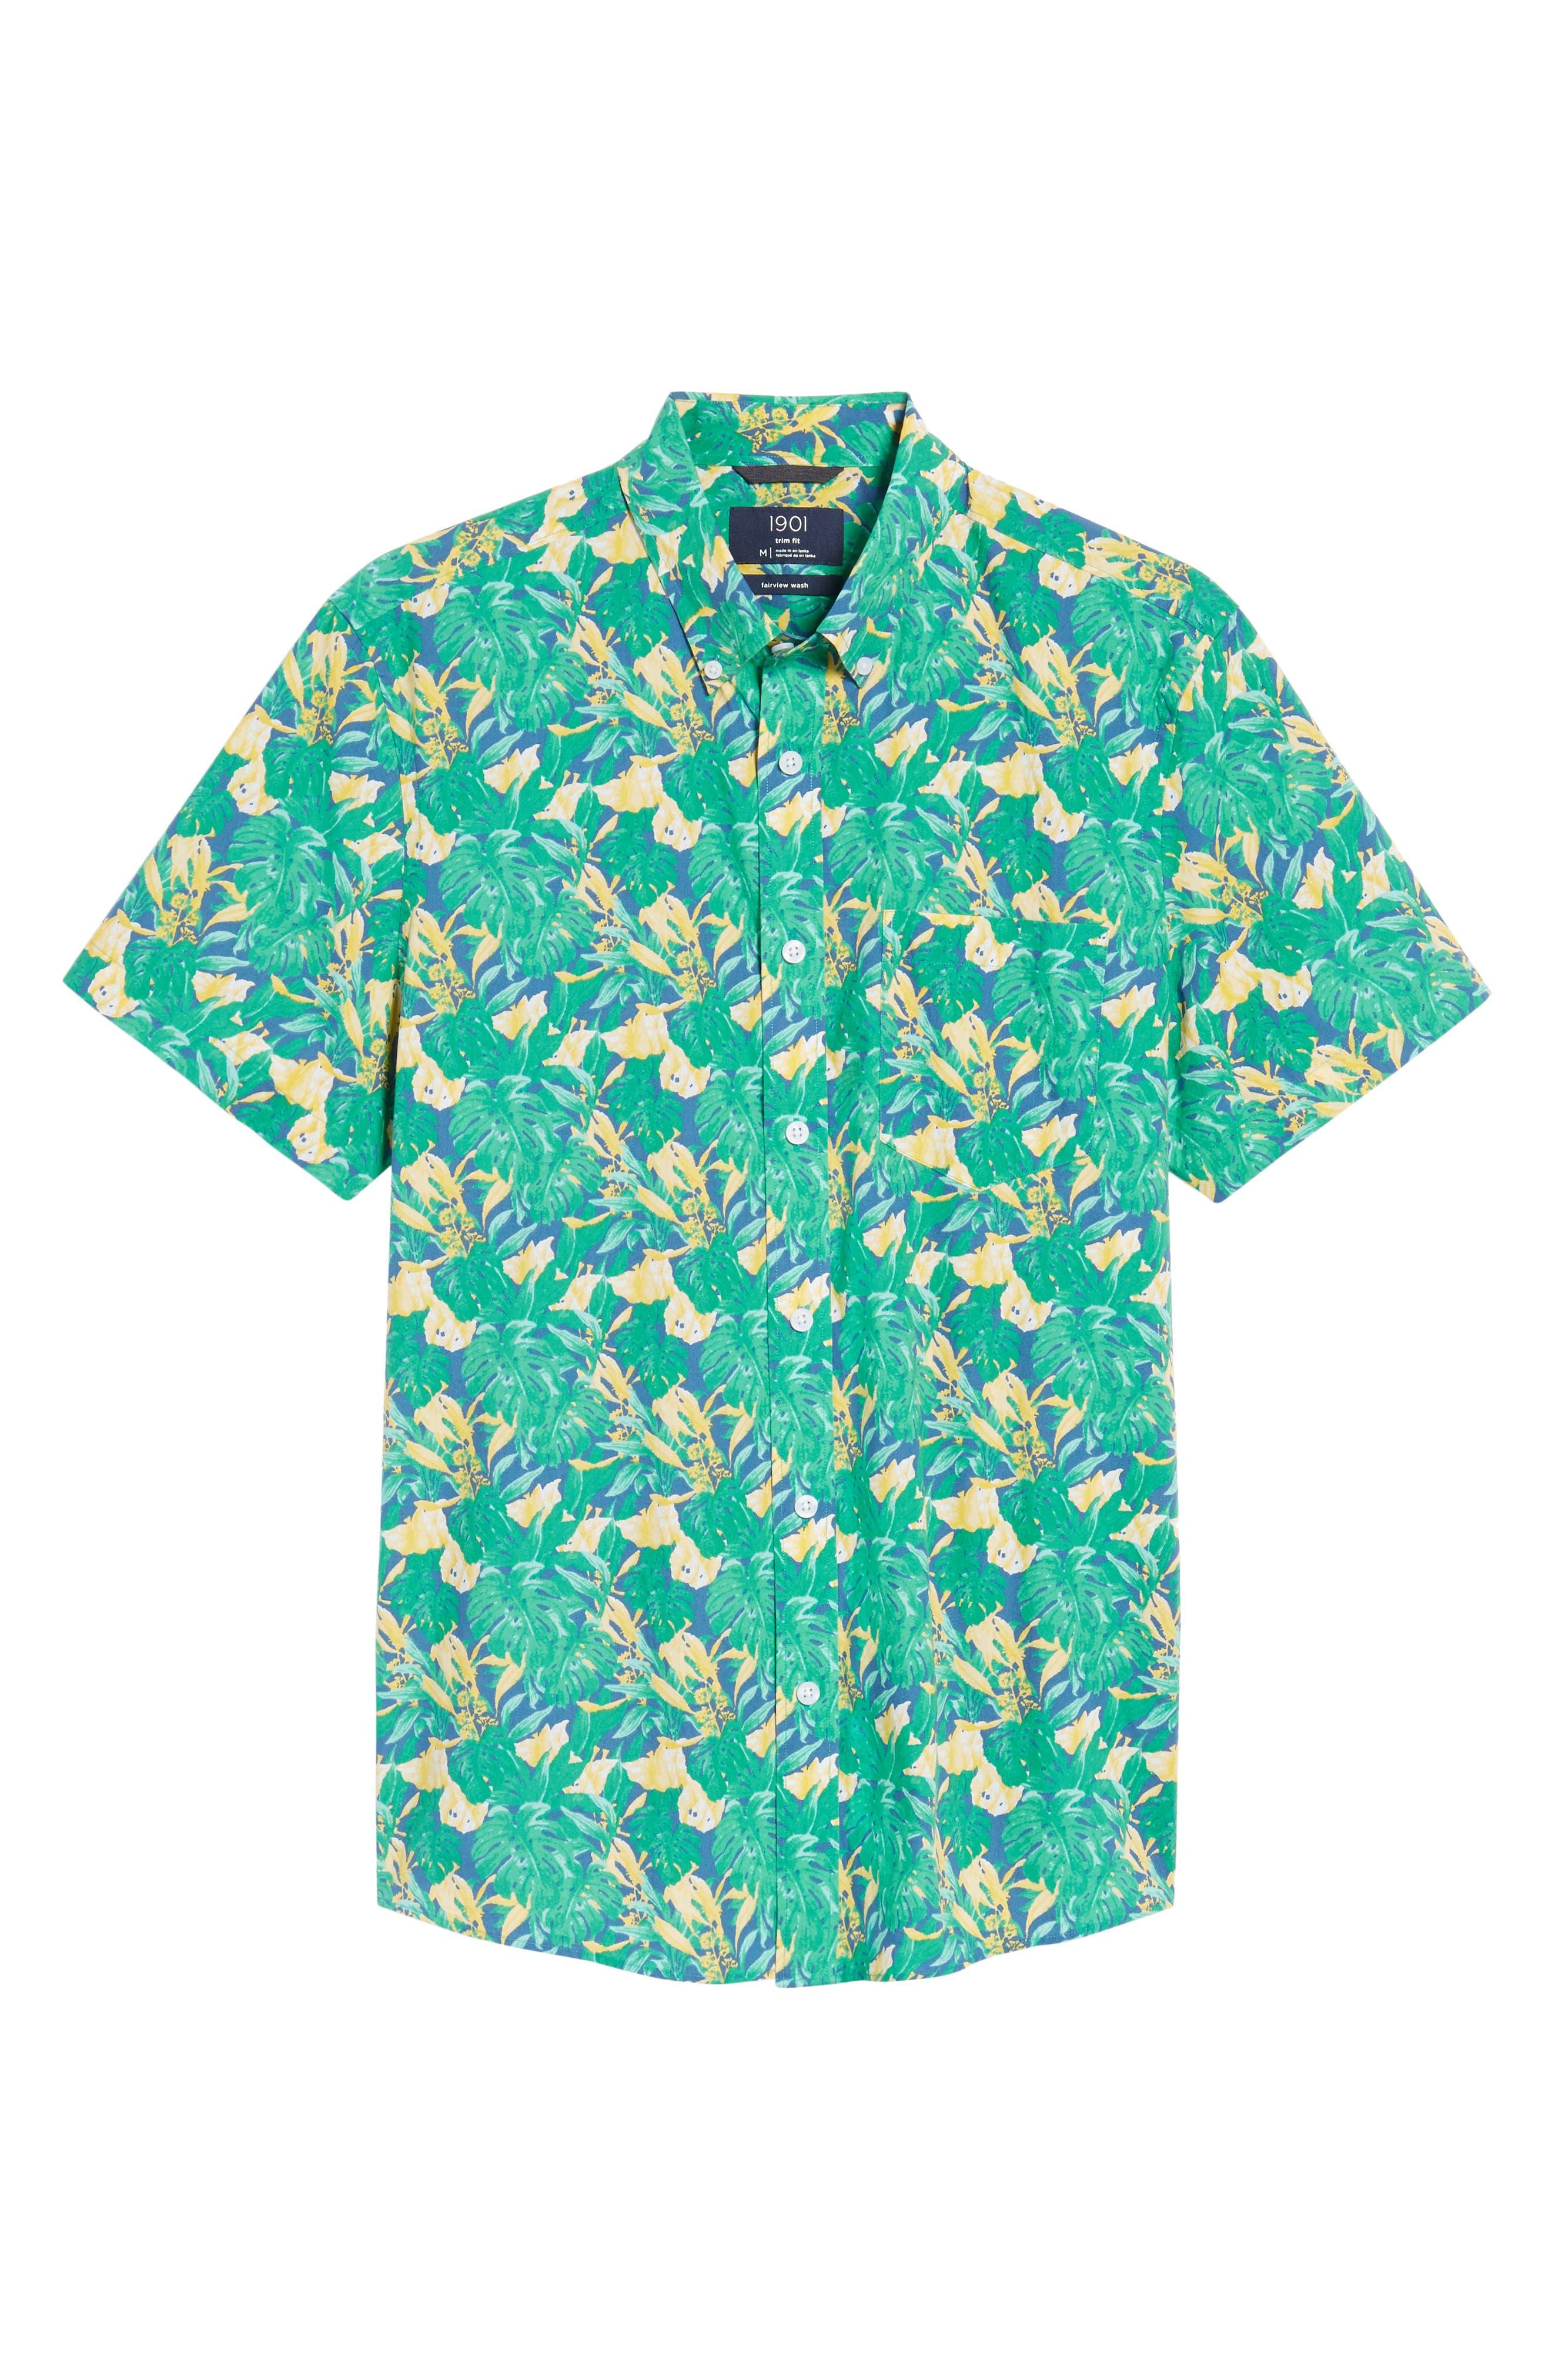 Trim Fit Leaf Print Sport Shirt,                             Alternate thumbnail 6, color,                             Green Yellow Split Leaves